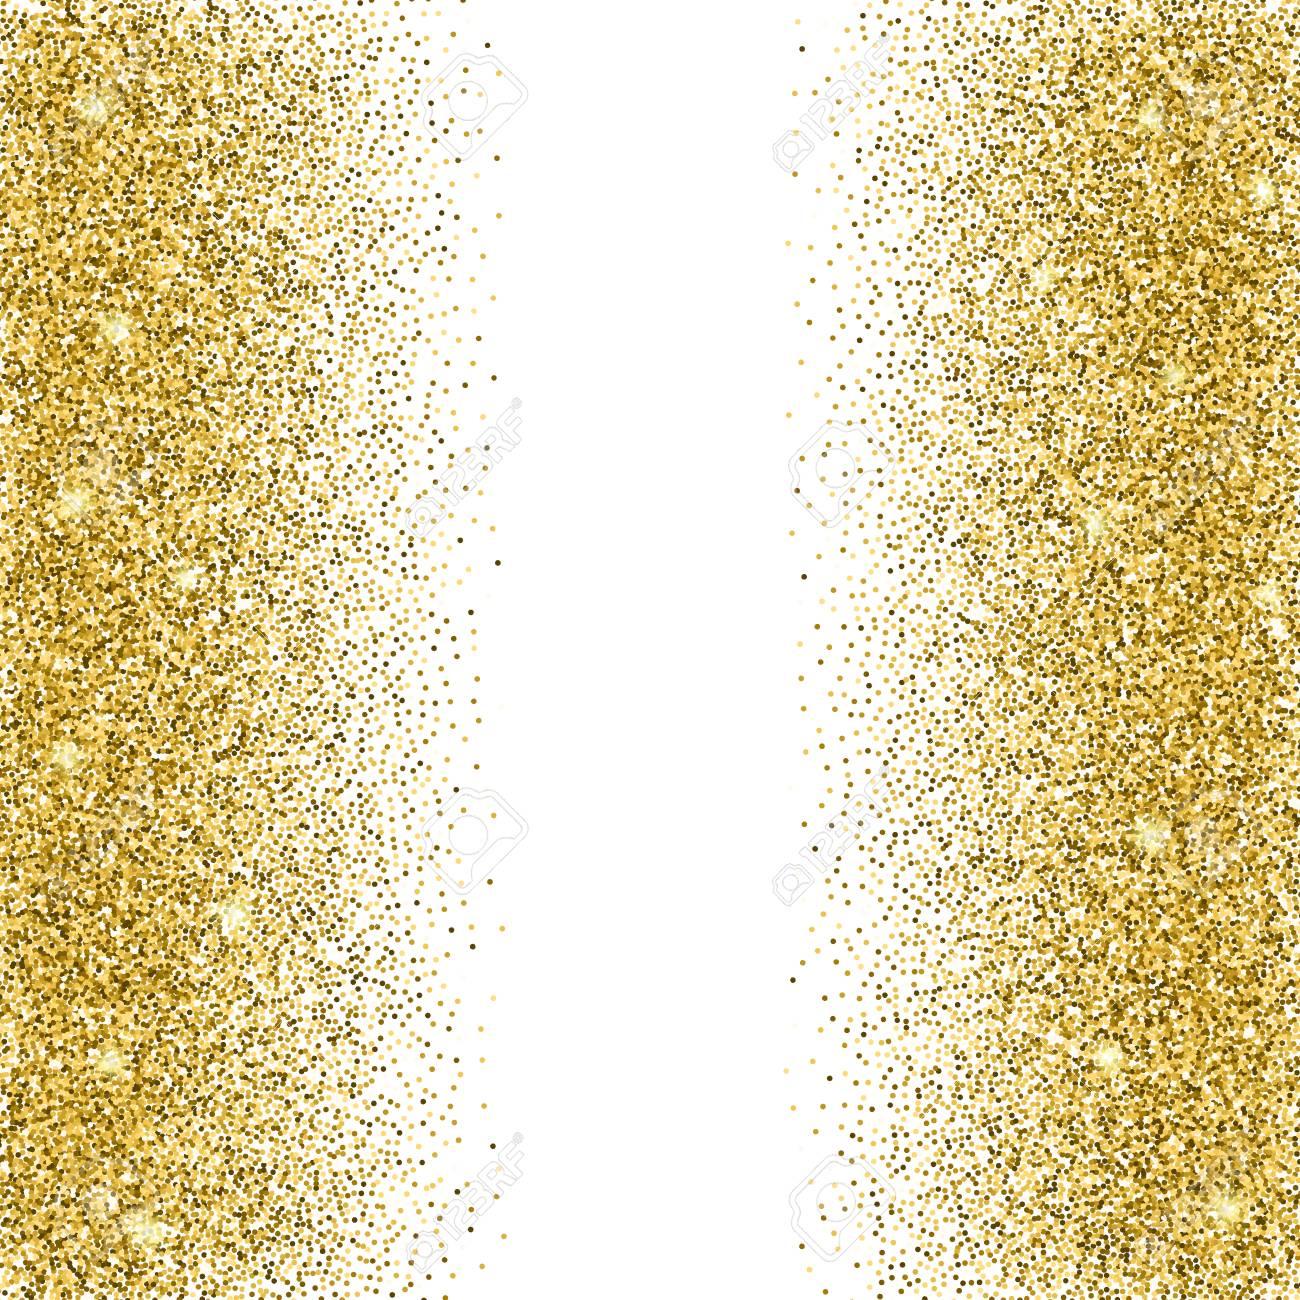 Gold Glitter Background Gold Sparkles On White Background Creative